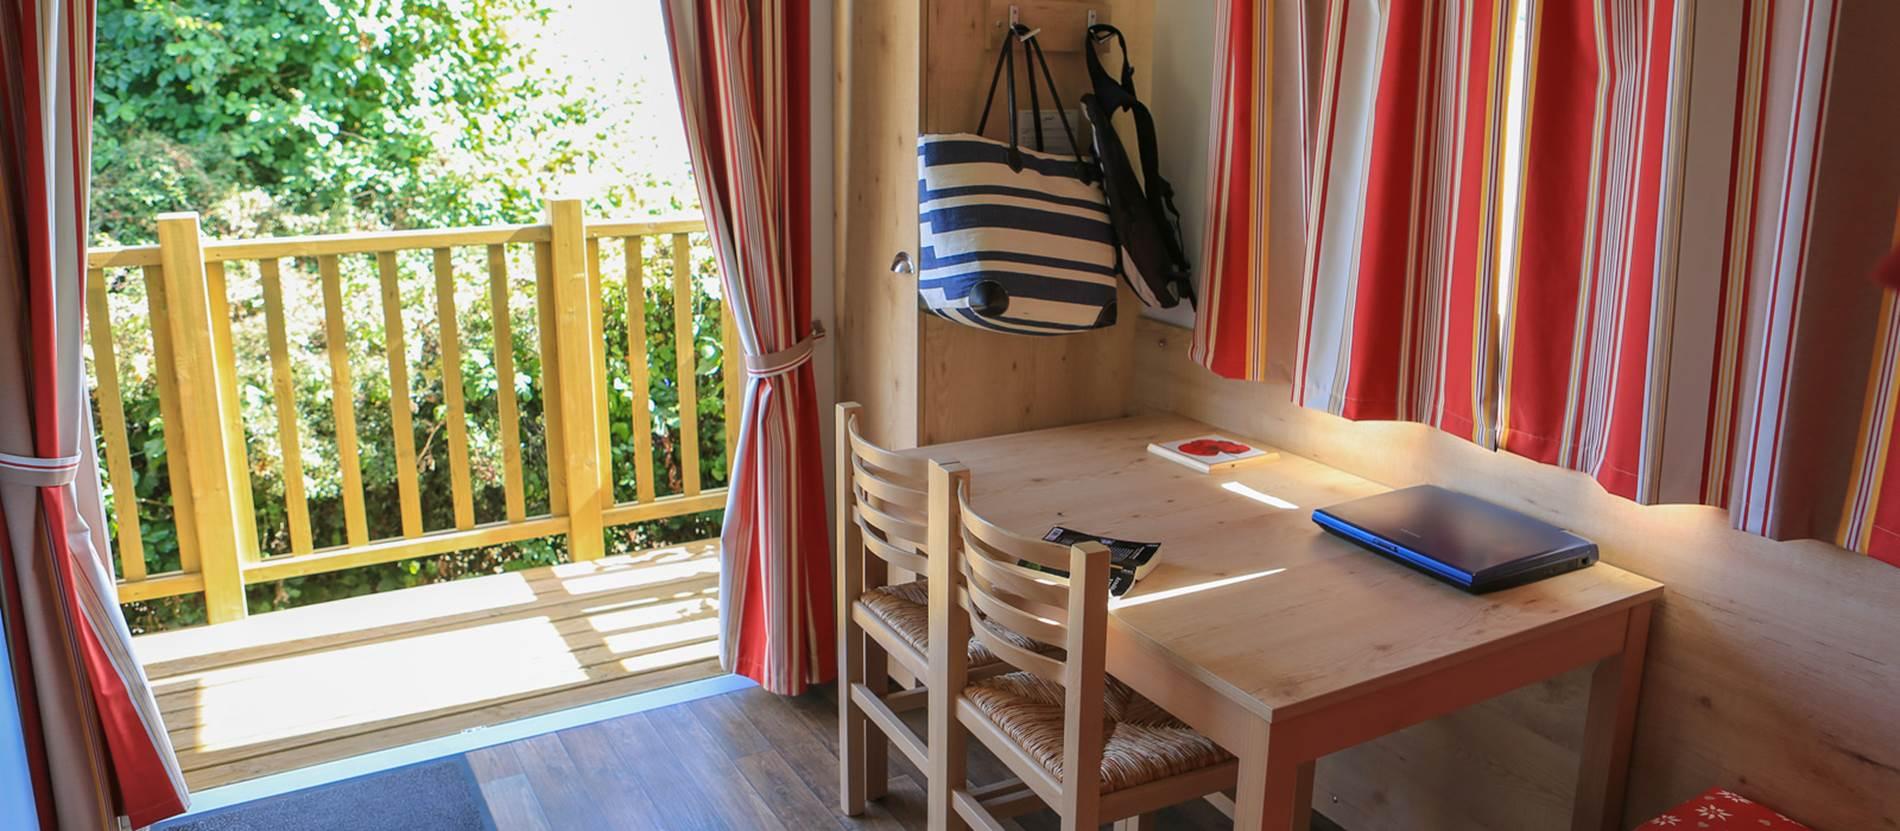 Camping-de-Cromenac'h-Ambon-Morbihan-bretagne-Sud © Camping-de-Cromenac'h-Ambon